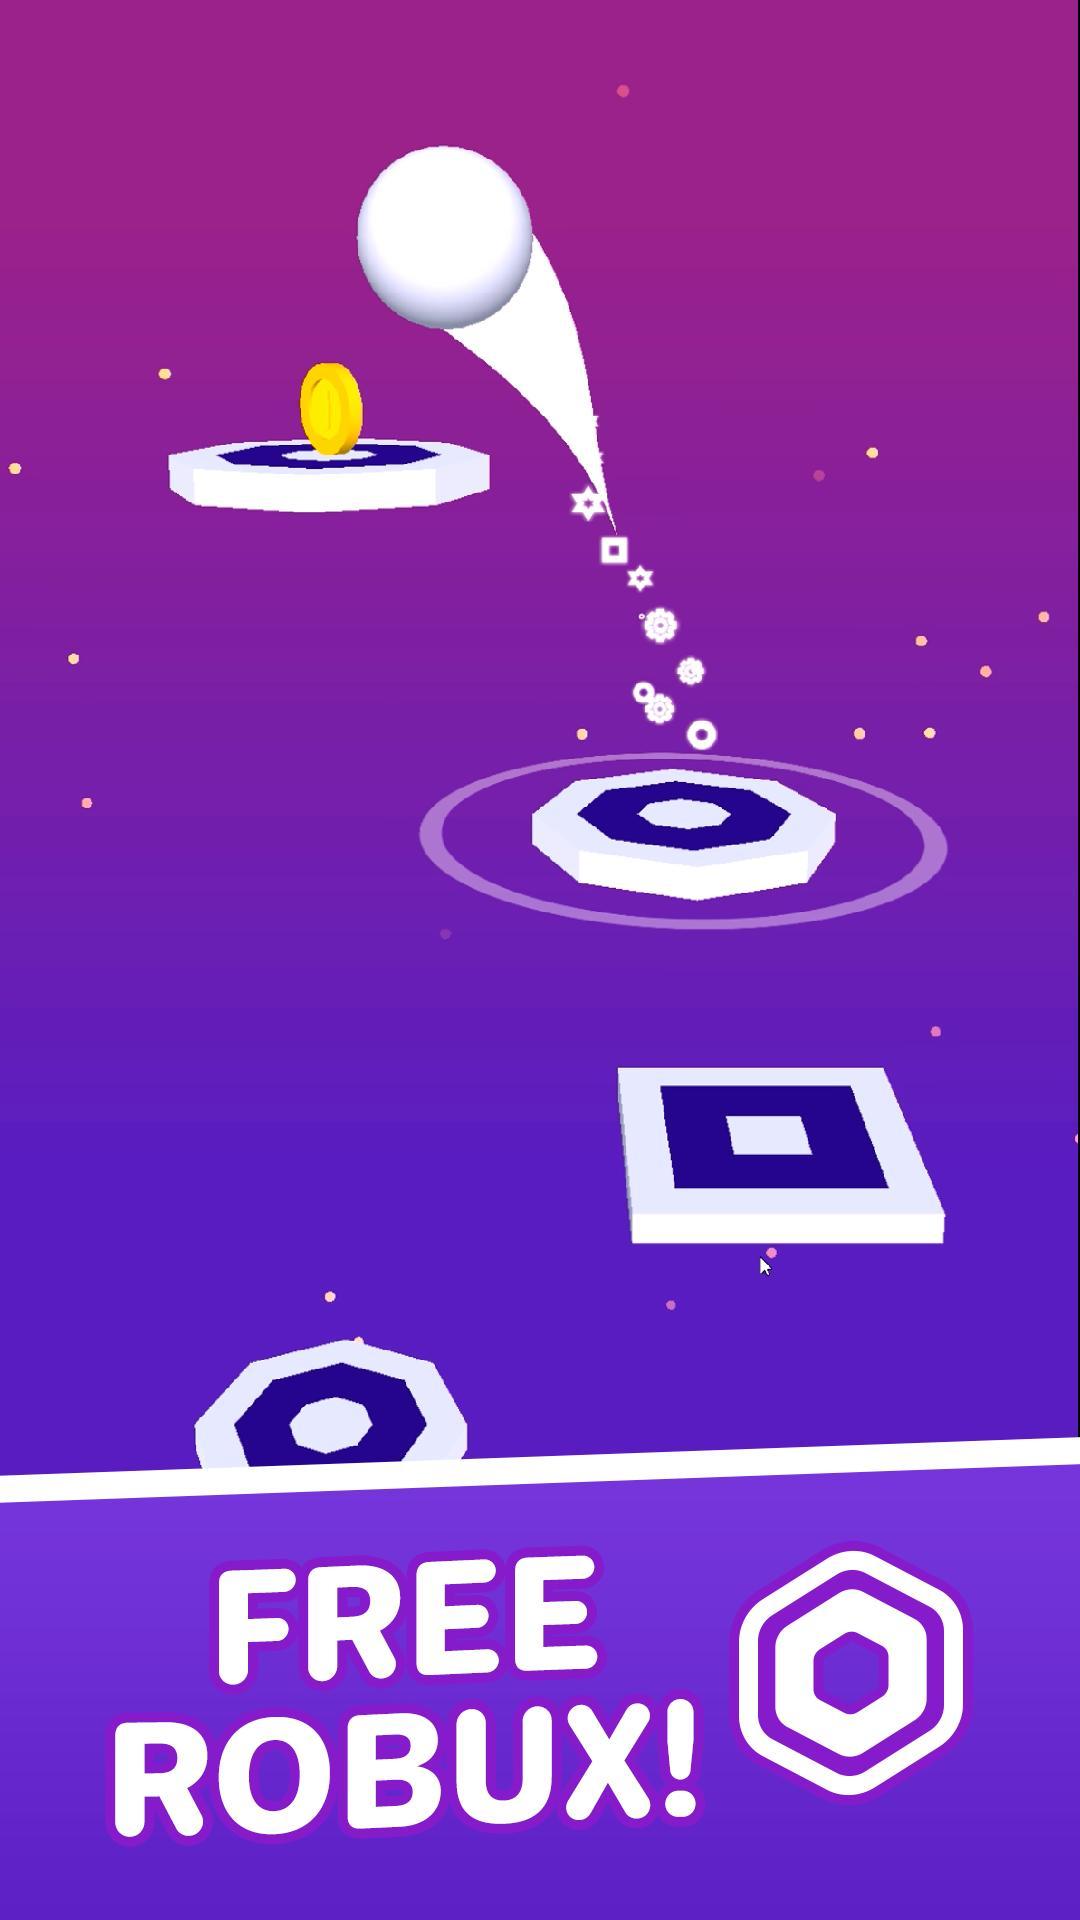 Free Robux Infinite Jump 1.3 Screenshot 1